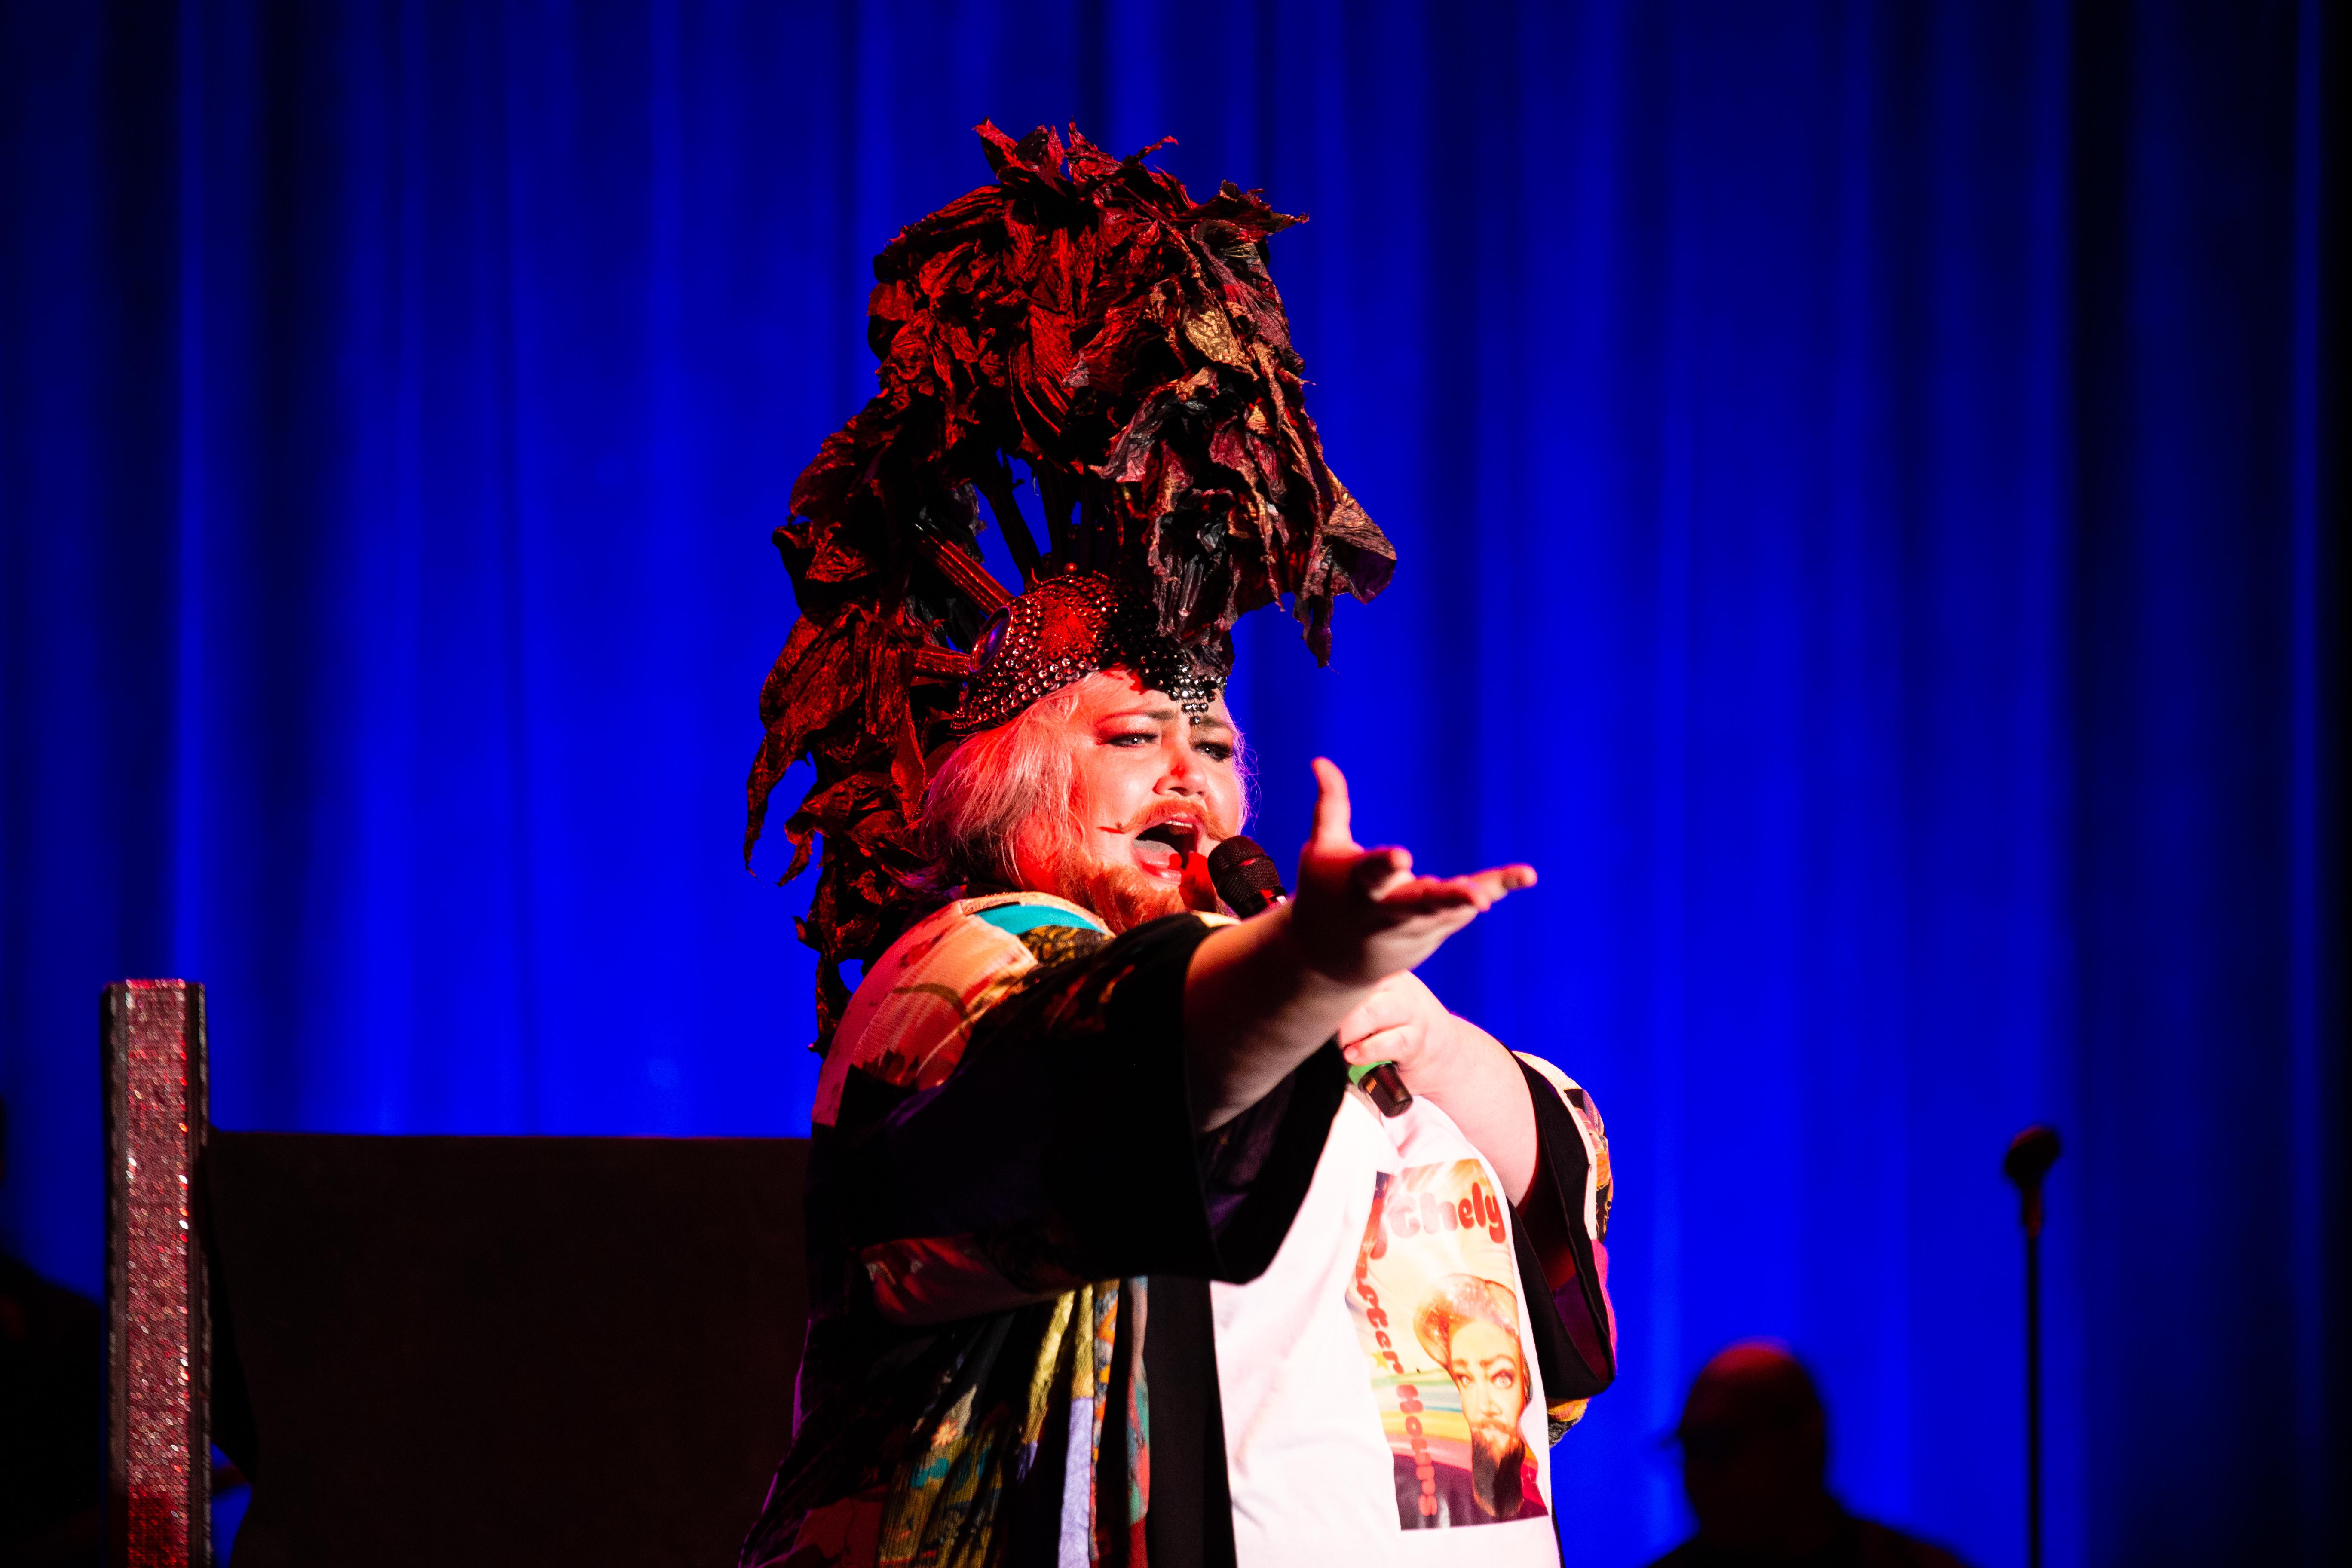 For the second year in a row, mezzo-soprano Stephanie Blythe took on a drag persona - Blythely Oratonio - as part of Opera Philadelphia´s annual opera festival.